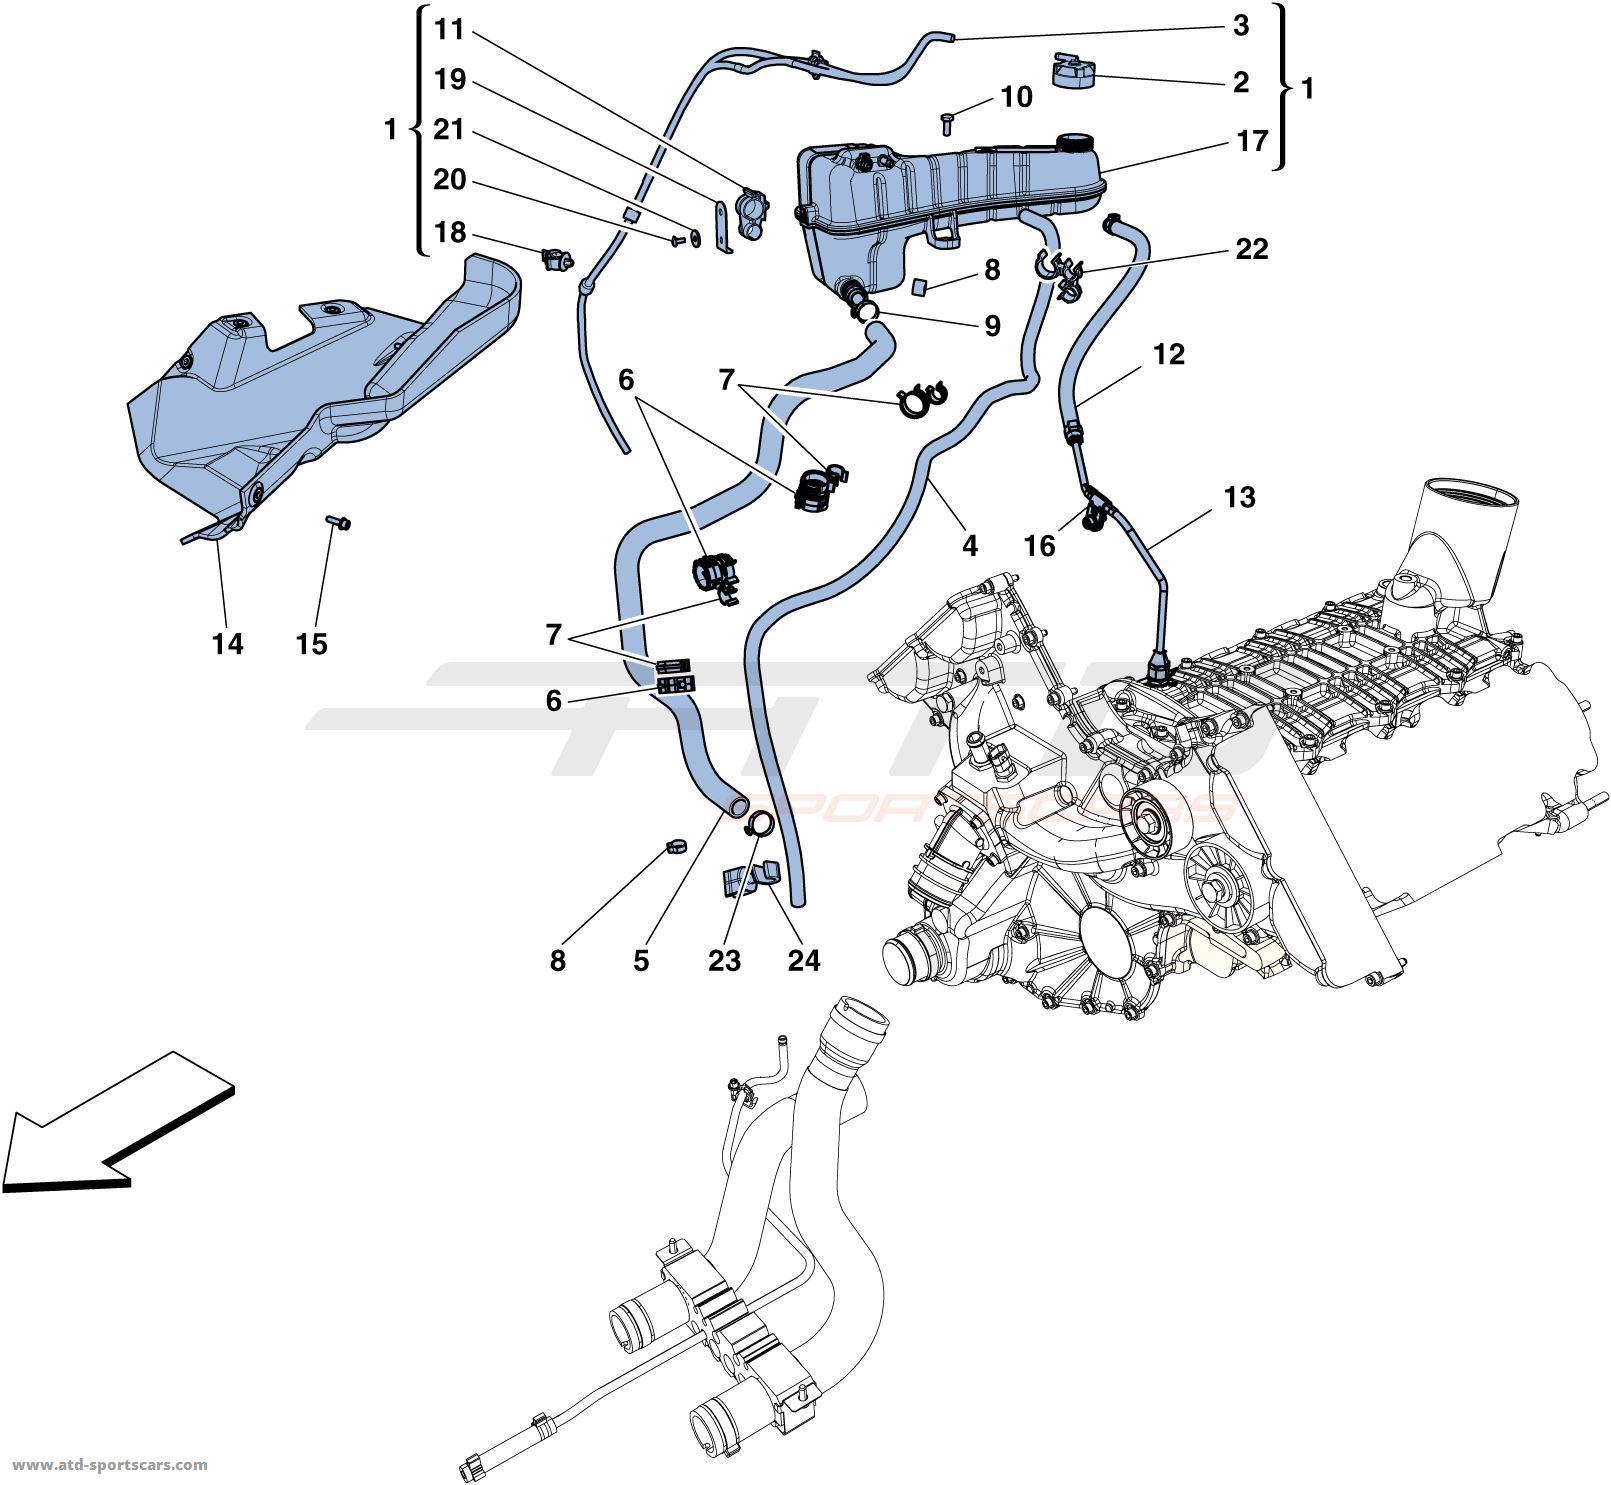 Ferrari 458 Italia COOLING - HEADER TANK AND PIPES | ATD-Sportscars